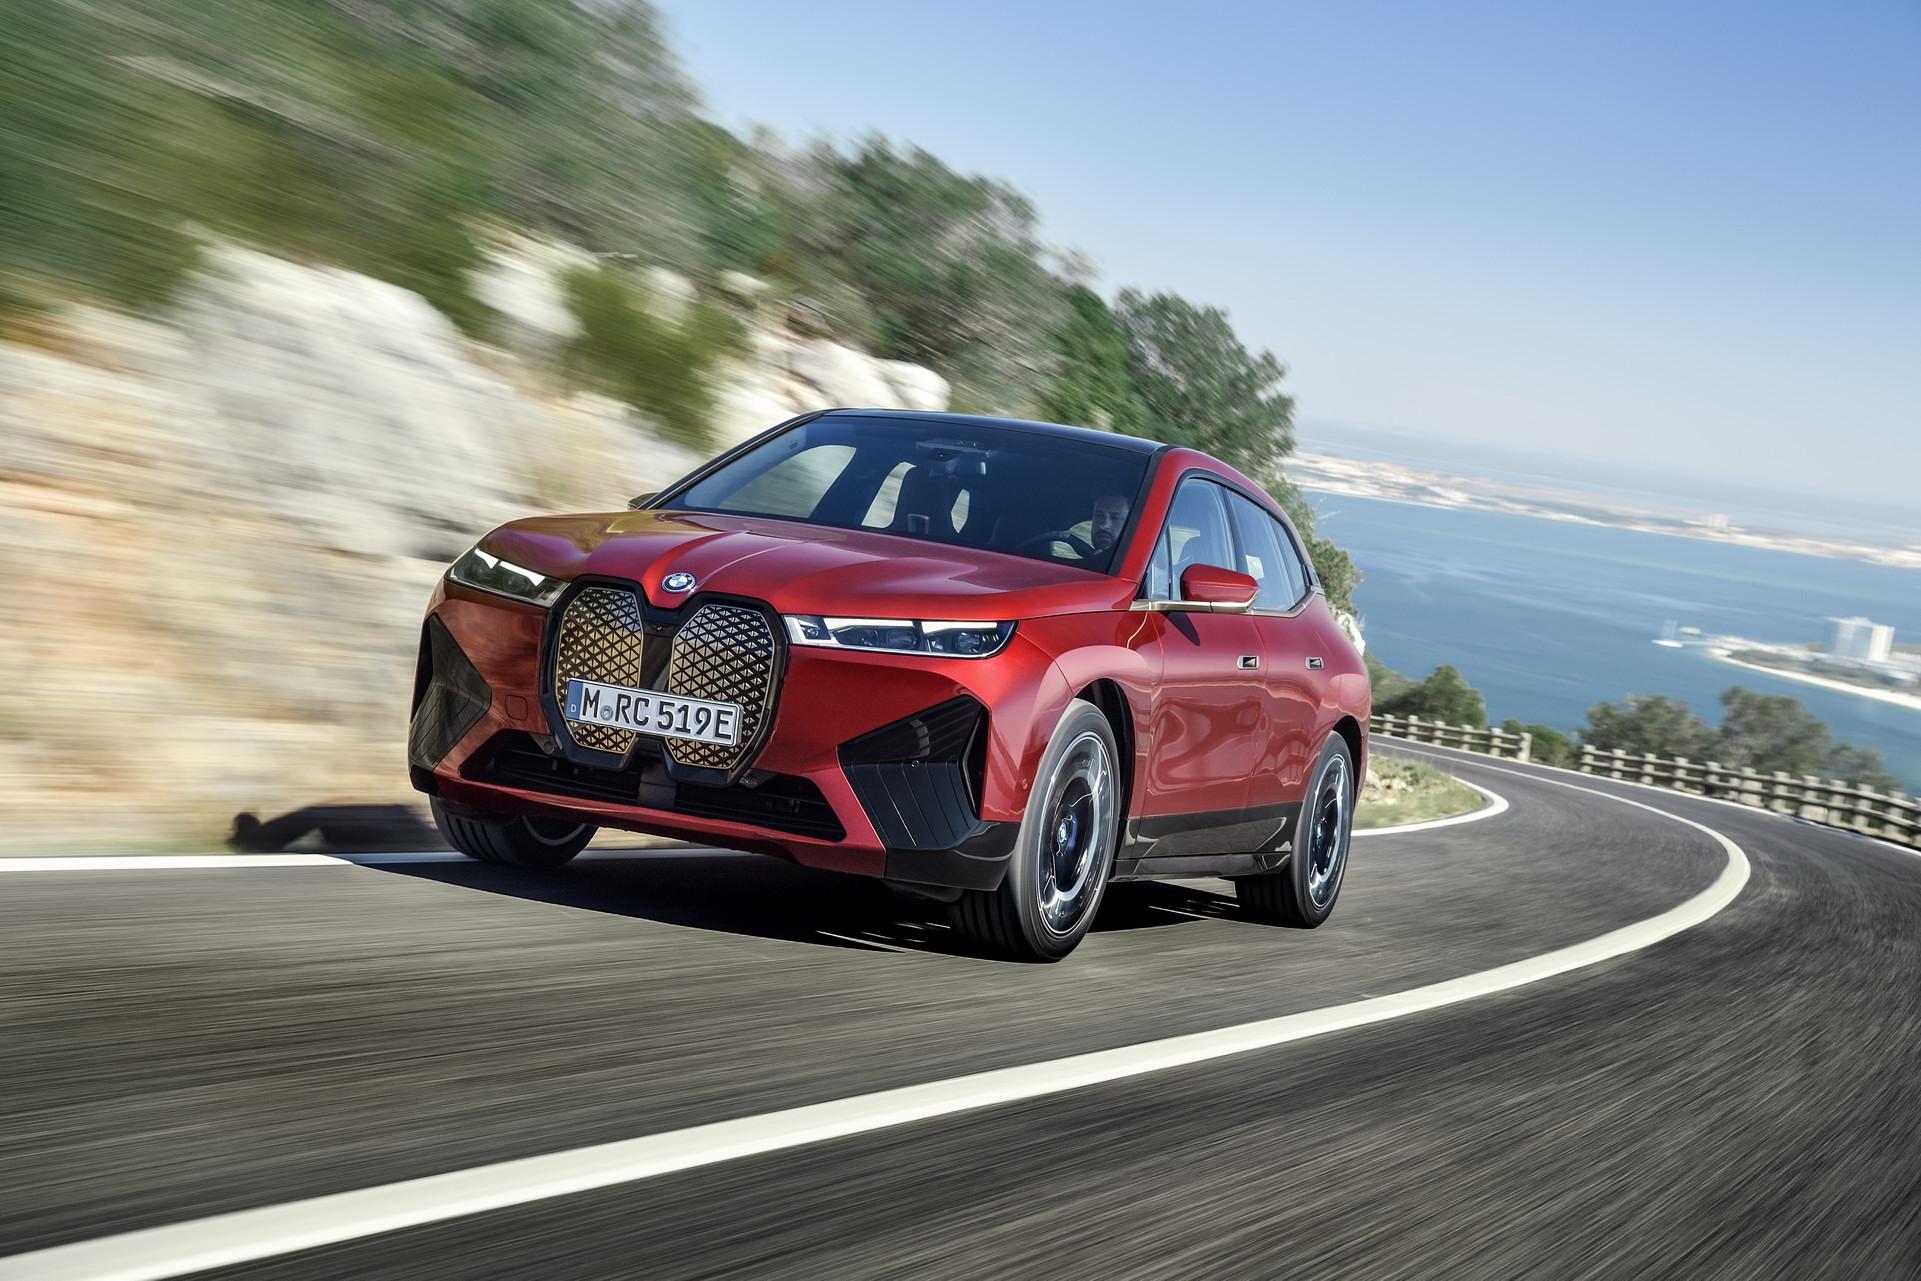 BMW iX nihayet tanıtıldı